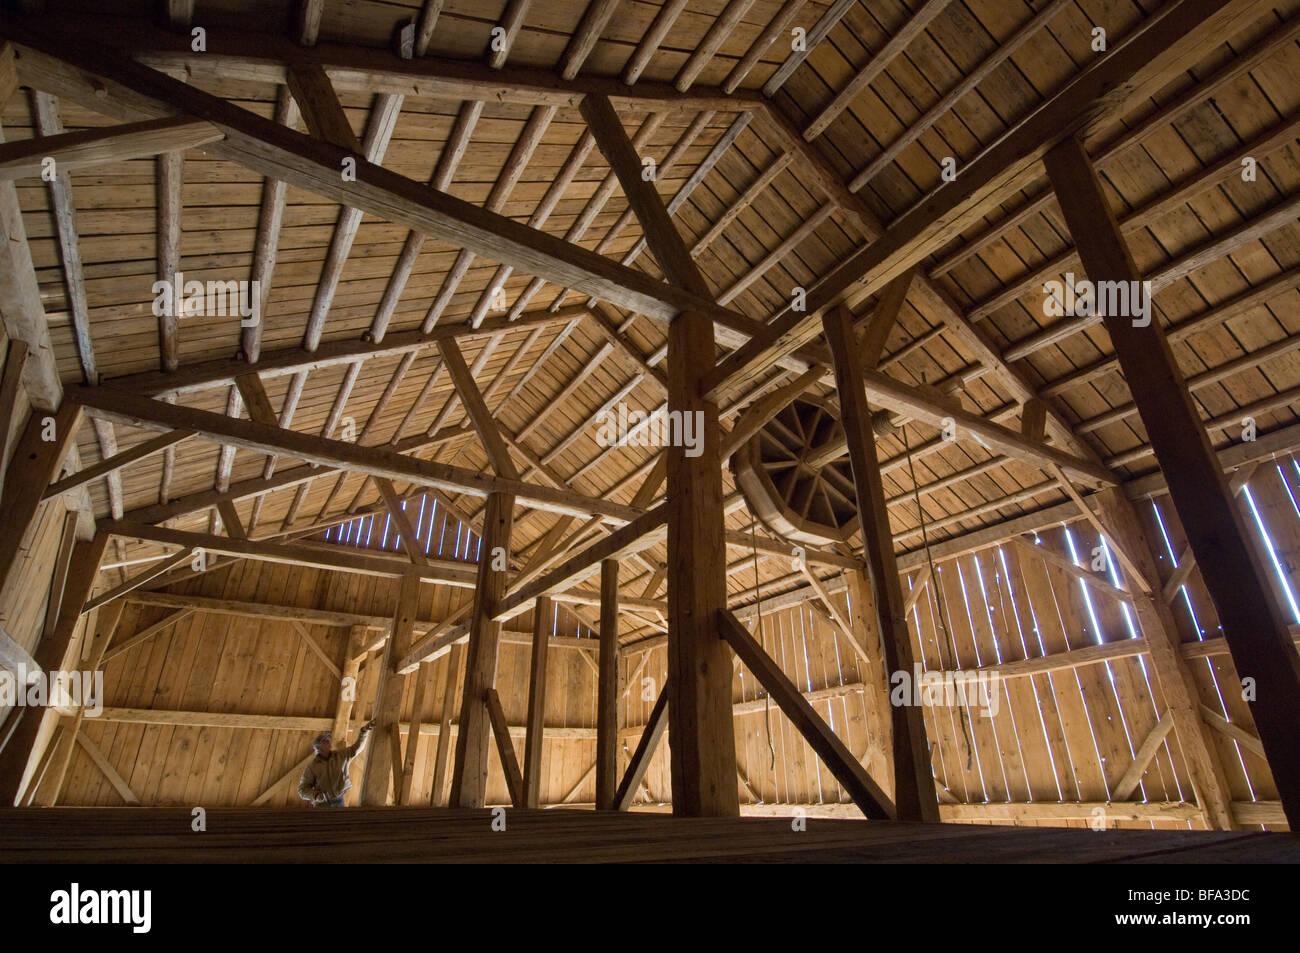 Empty timber frame barn Stock Photo: 26652456 - Alamy